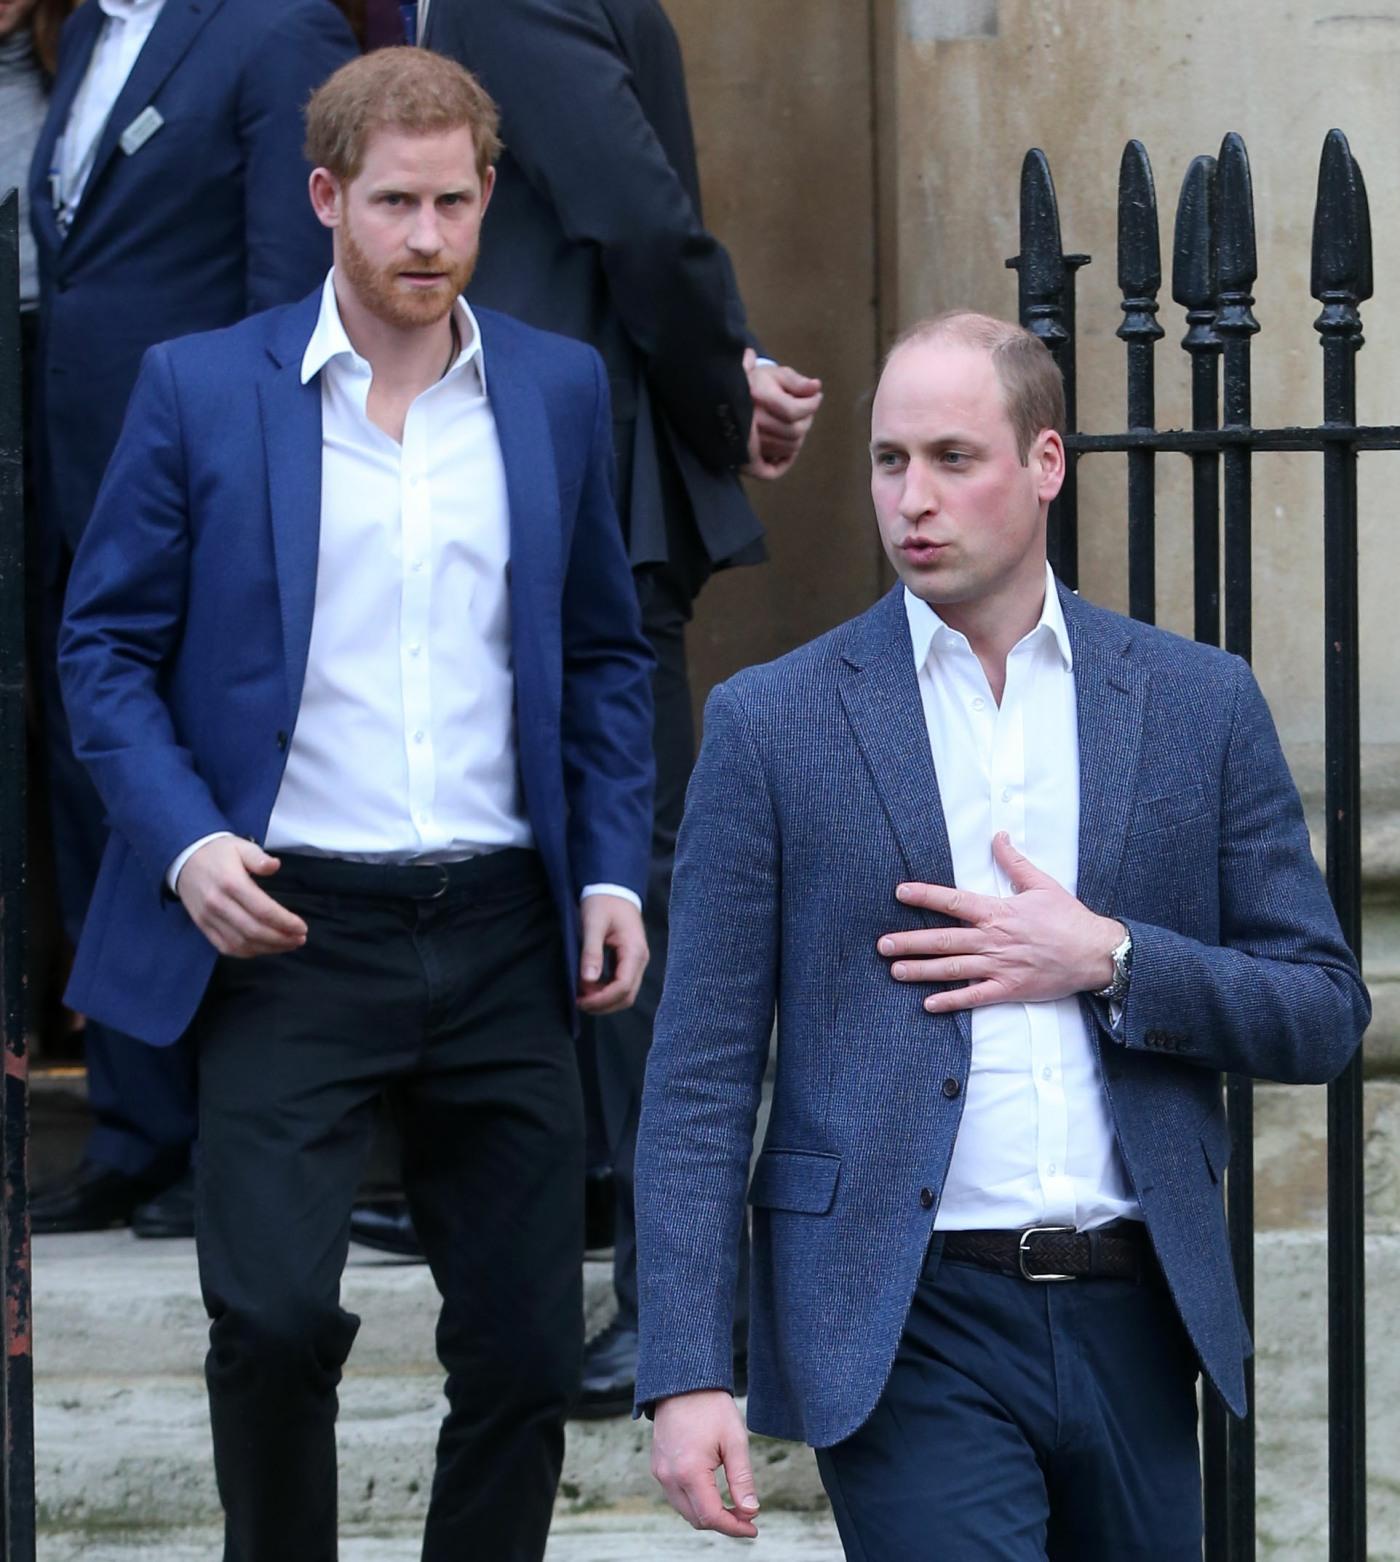 Prince Harry & William Met Yesterday